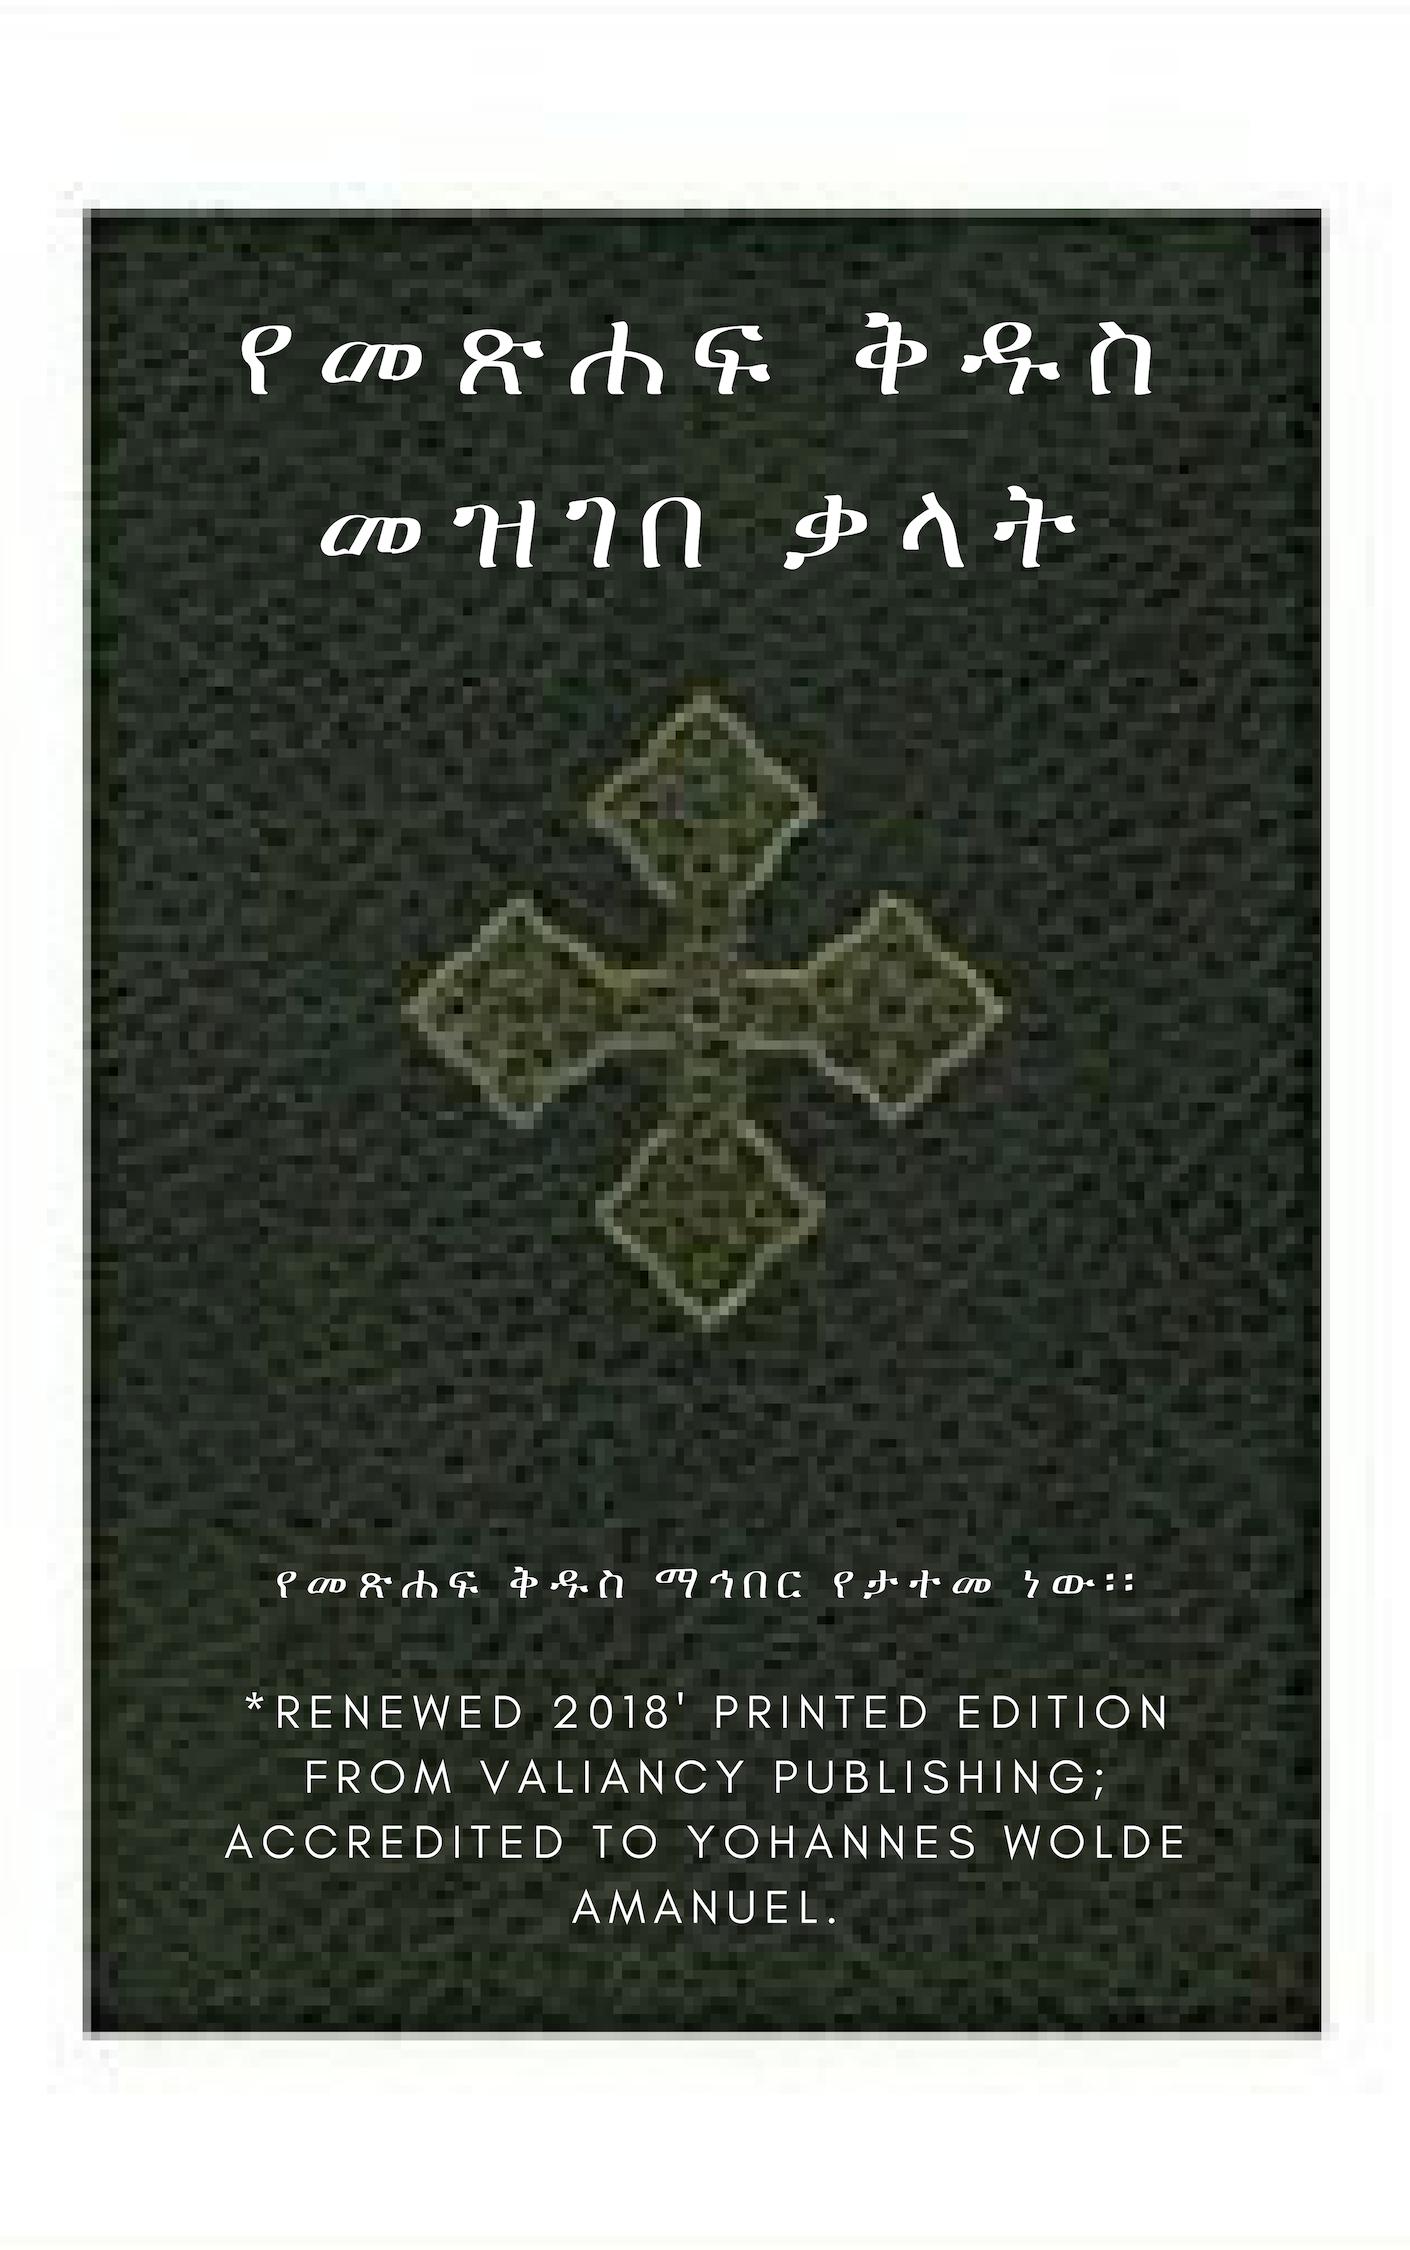 Amharic Bible Dict. - የመጽሐፍ ቅዱስ መዝገበ ቃላት (book cover)